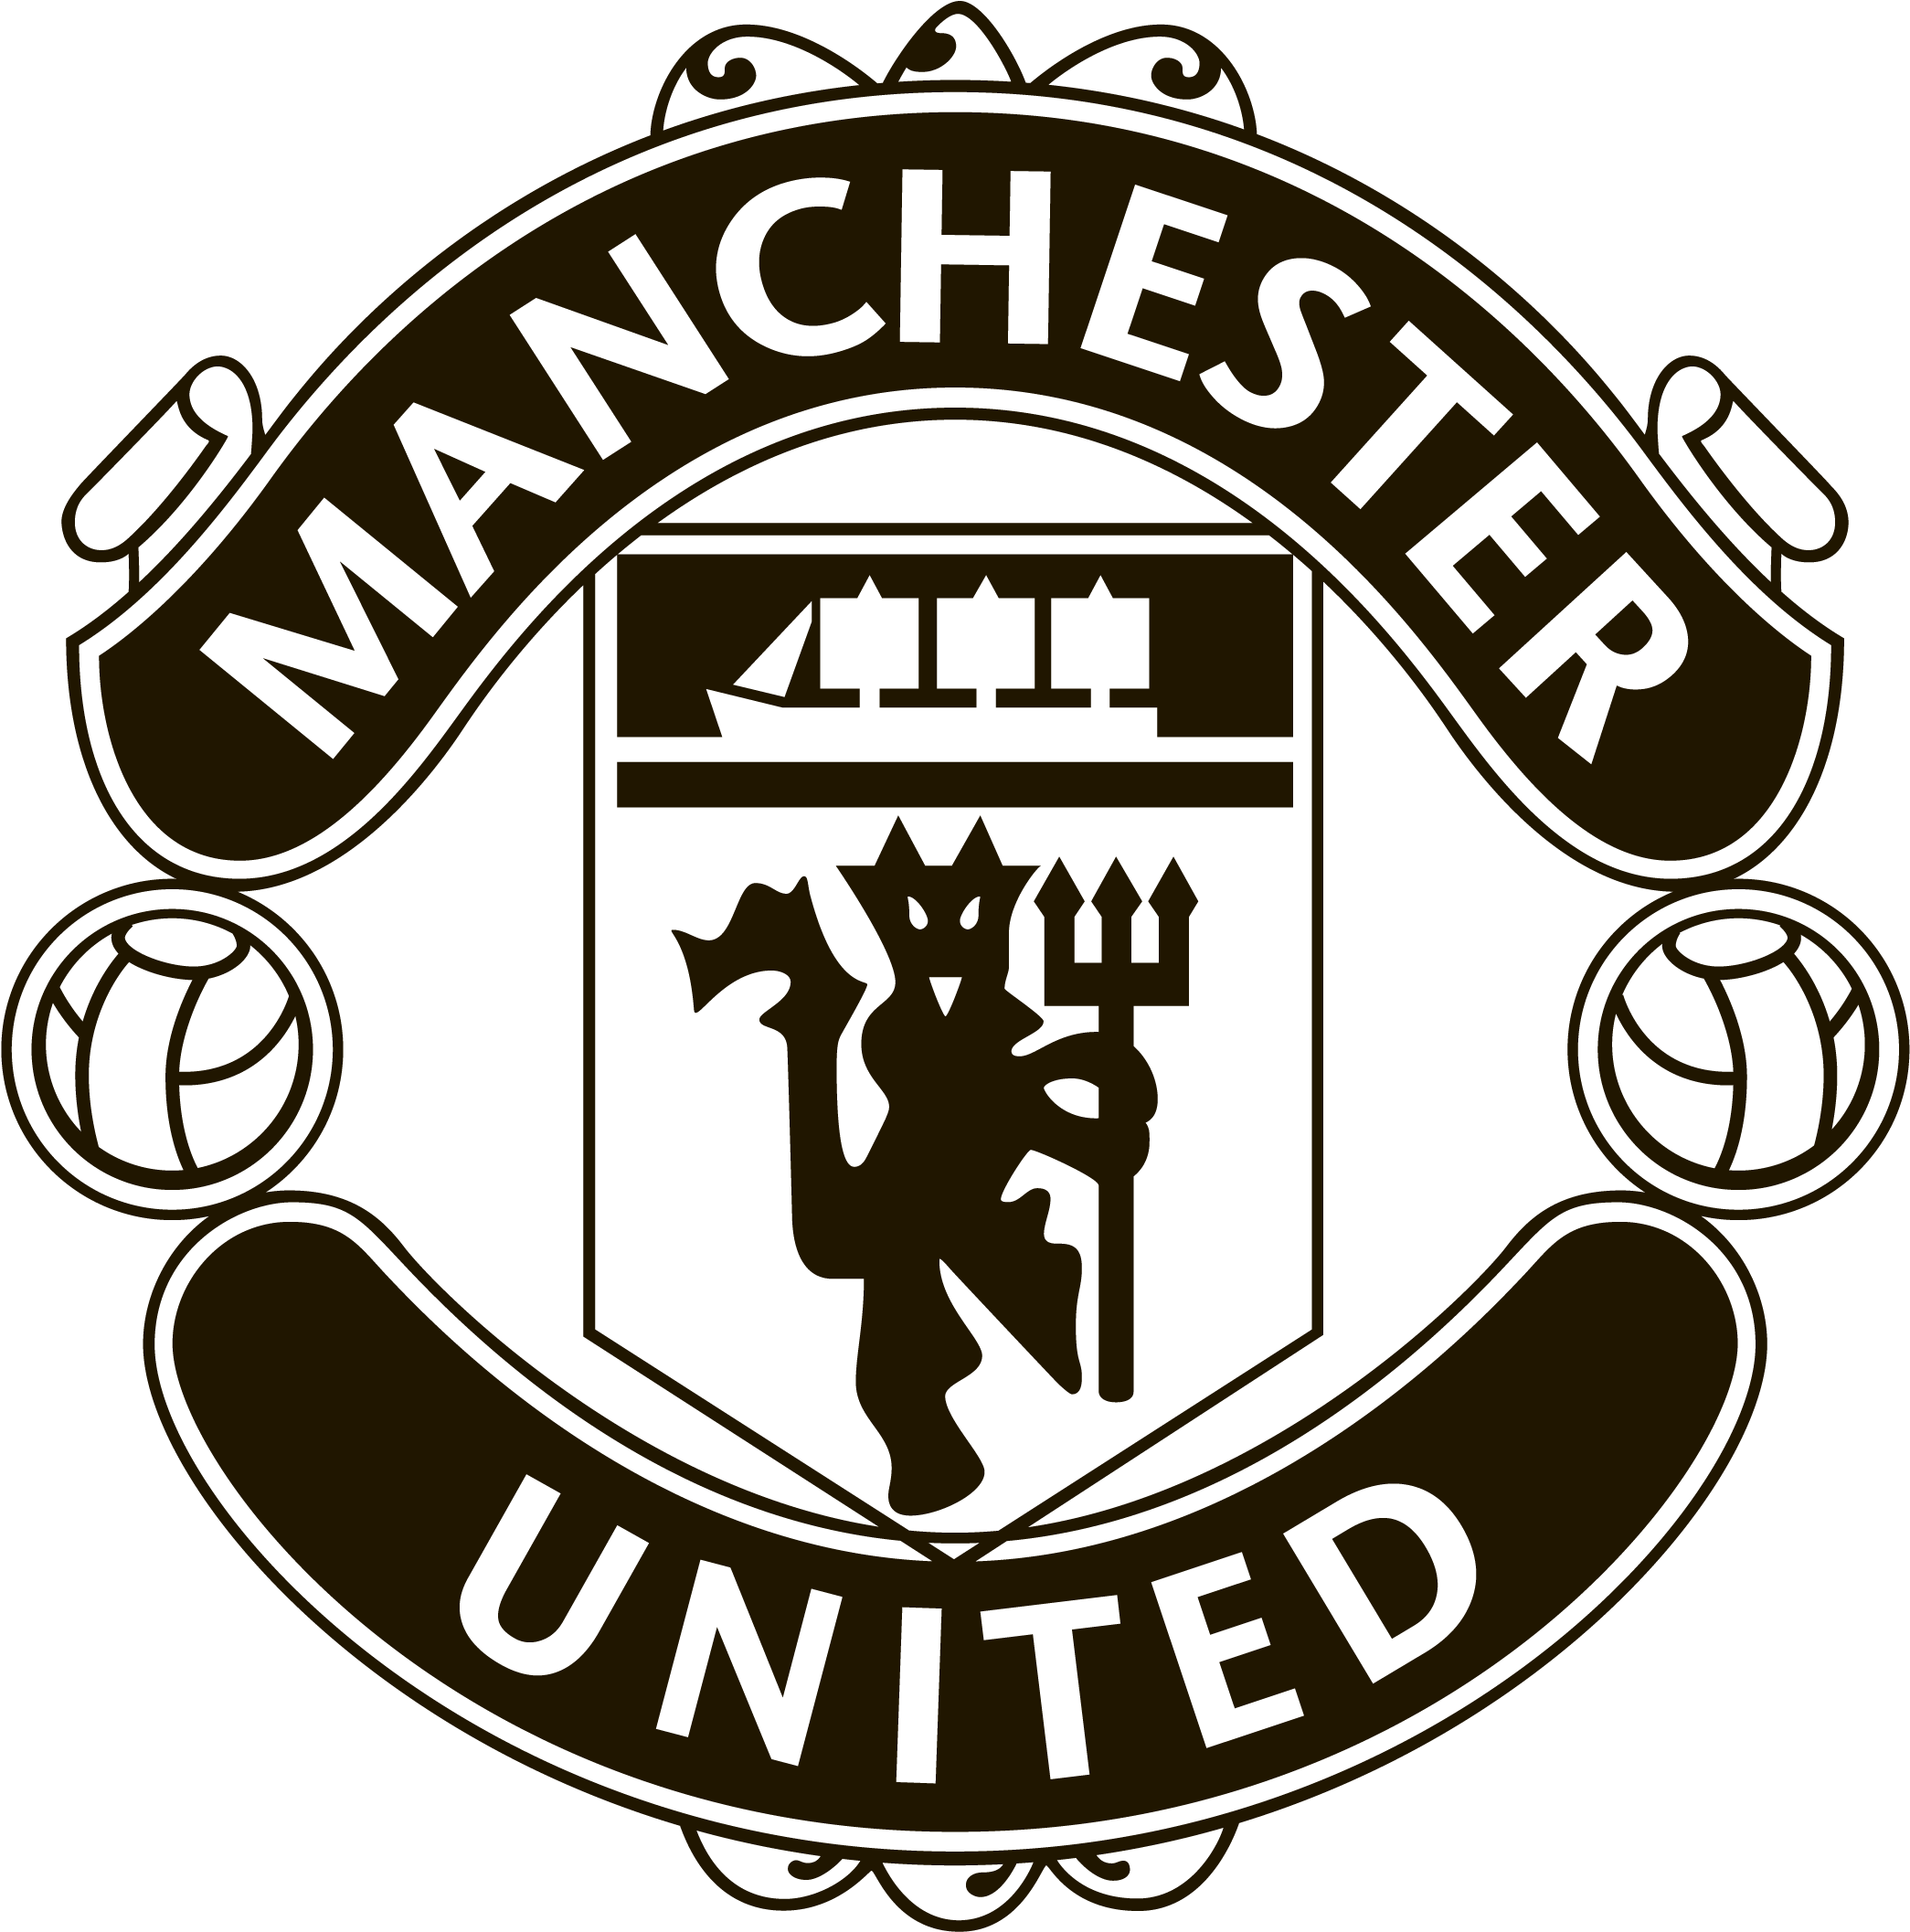 Download Manchester United Logo Png Transparent Picture Manchester United Black Logo Png Full Size Png Image Pngkit